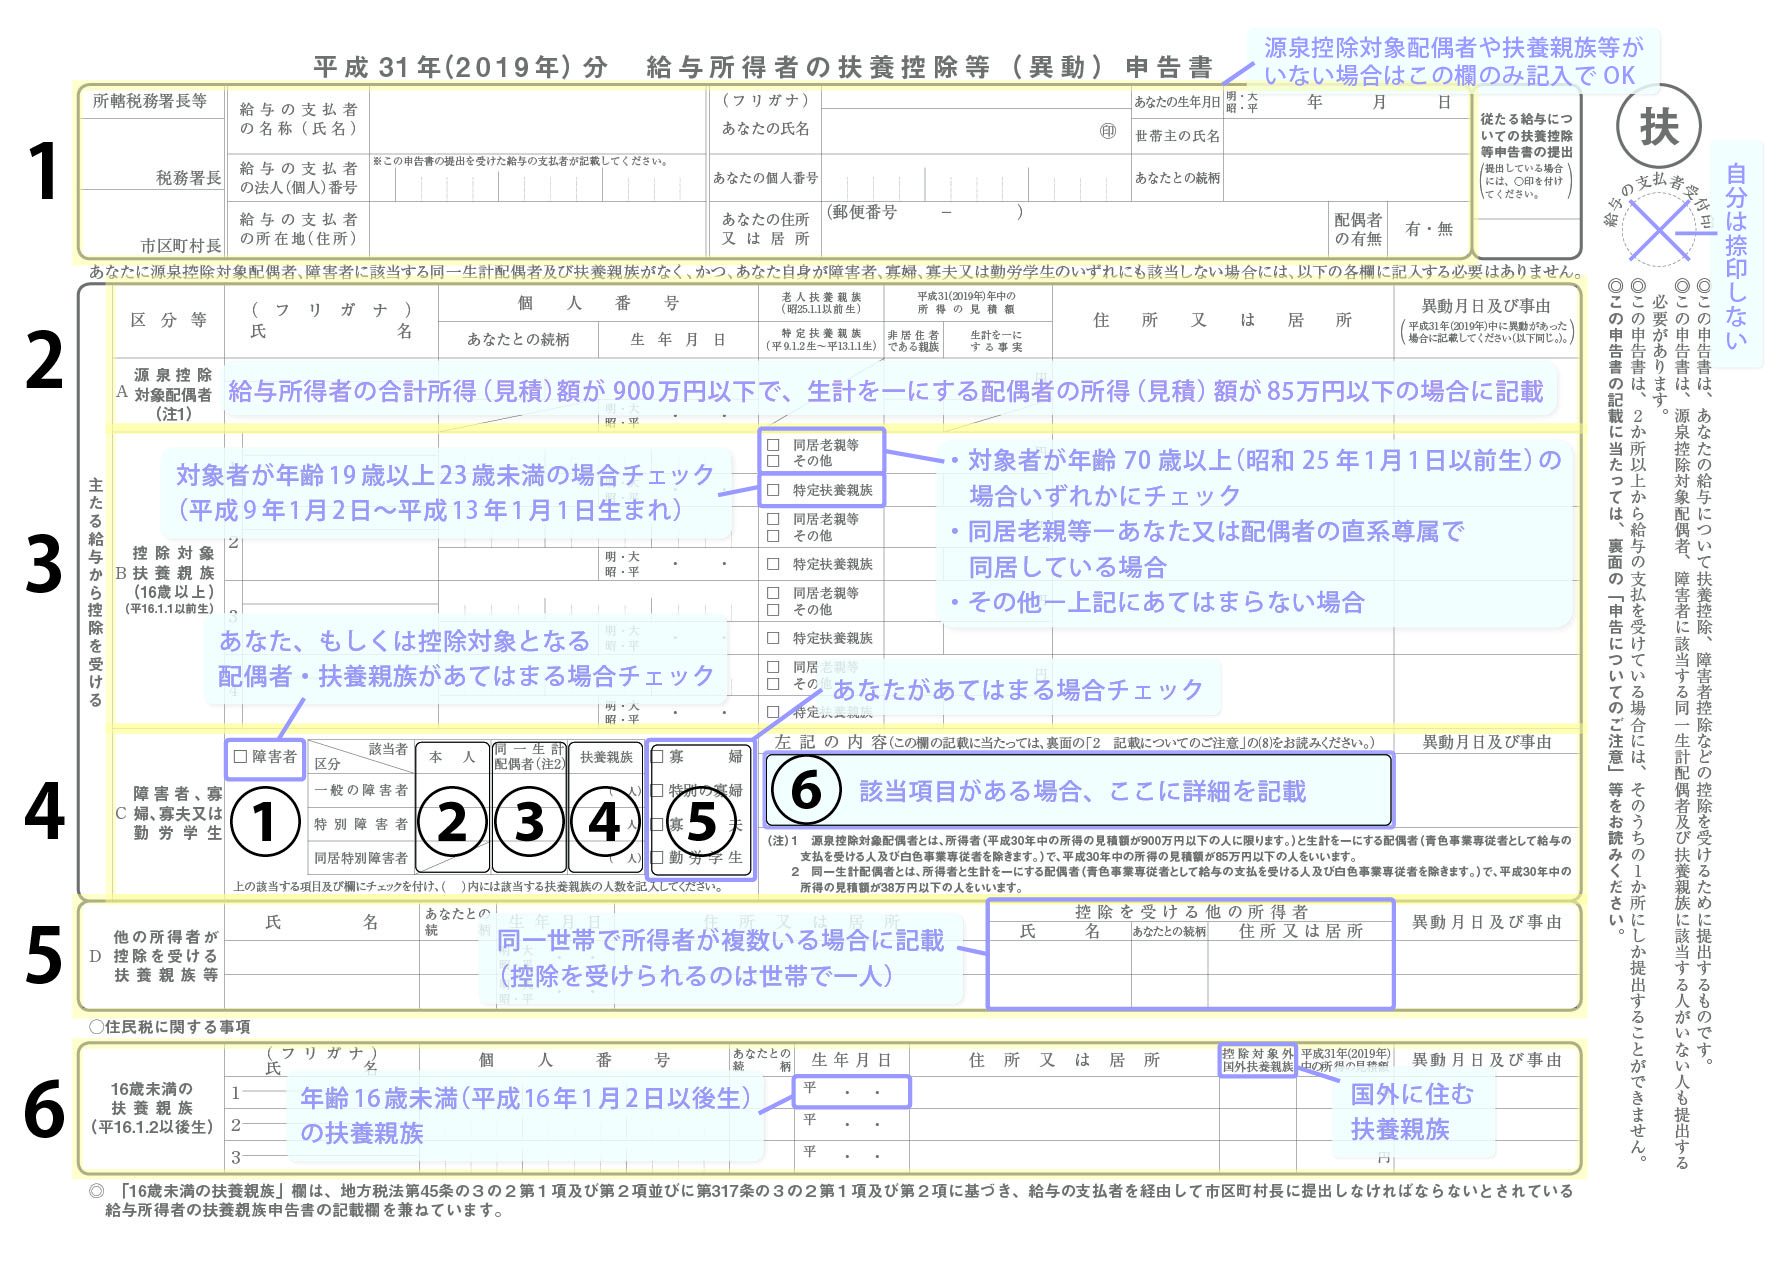 給与 所得 者 の 扶養 控除 等 申告 書 の 書き方